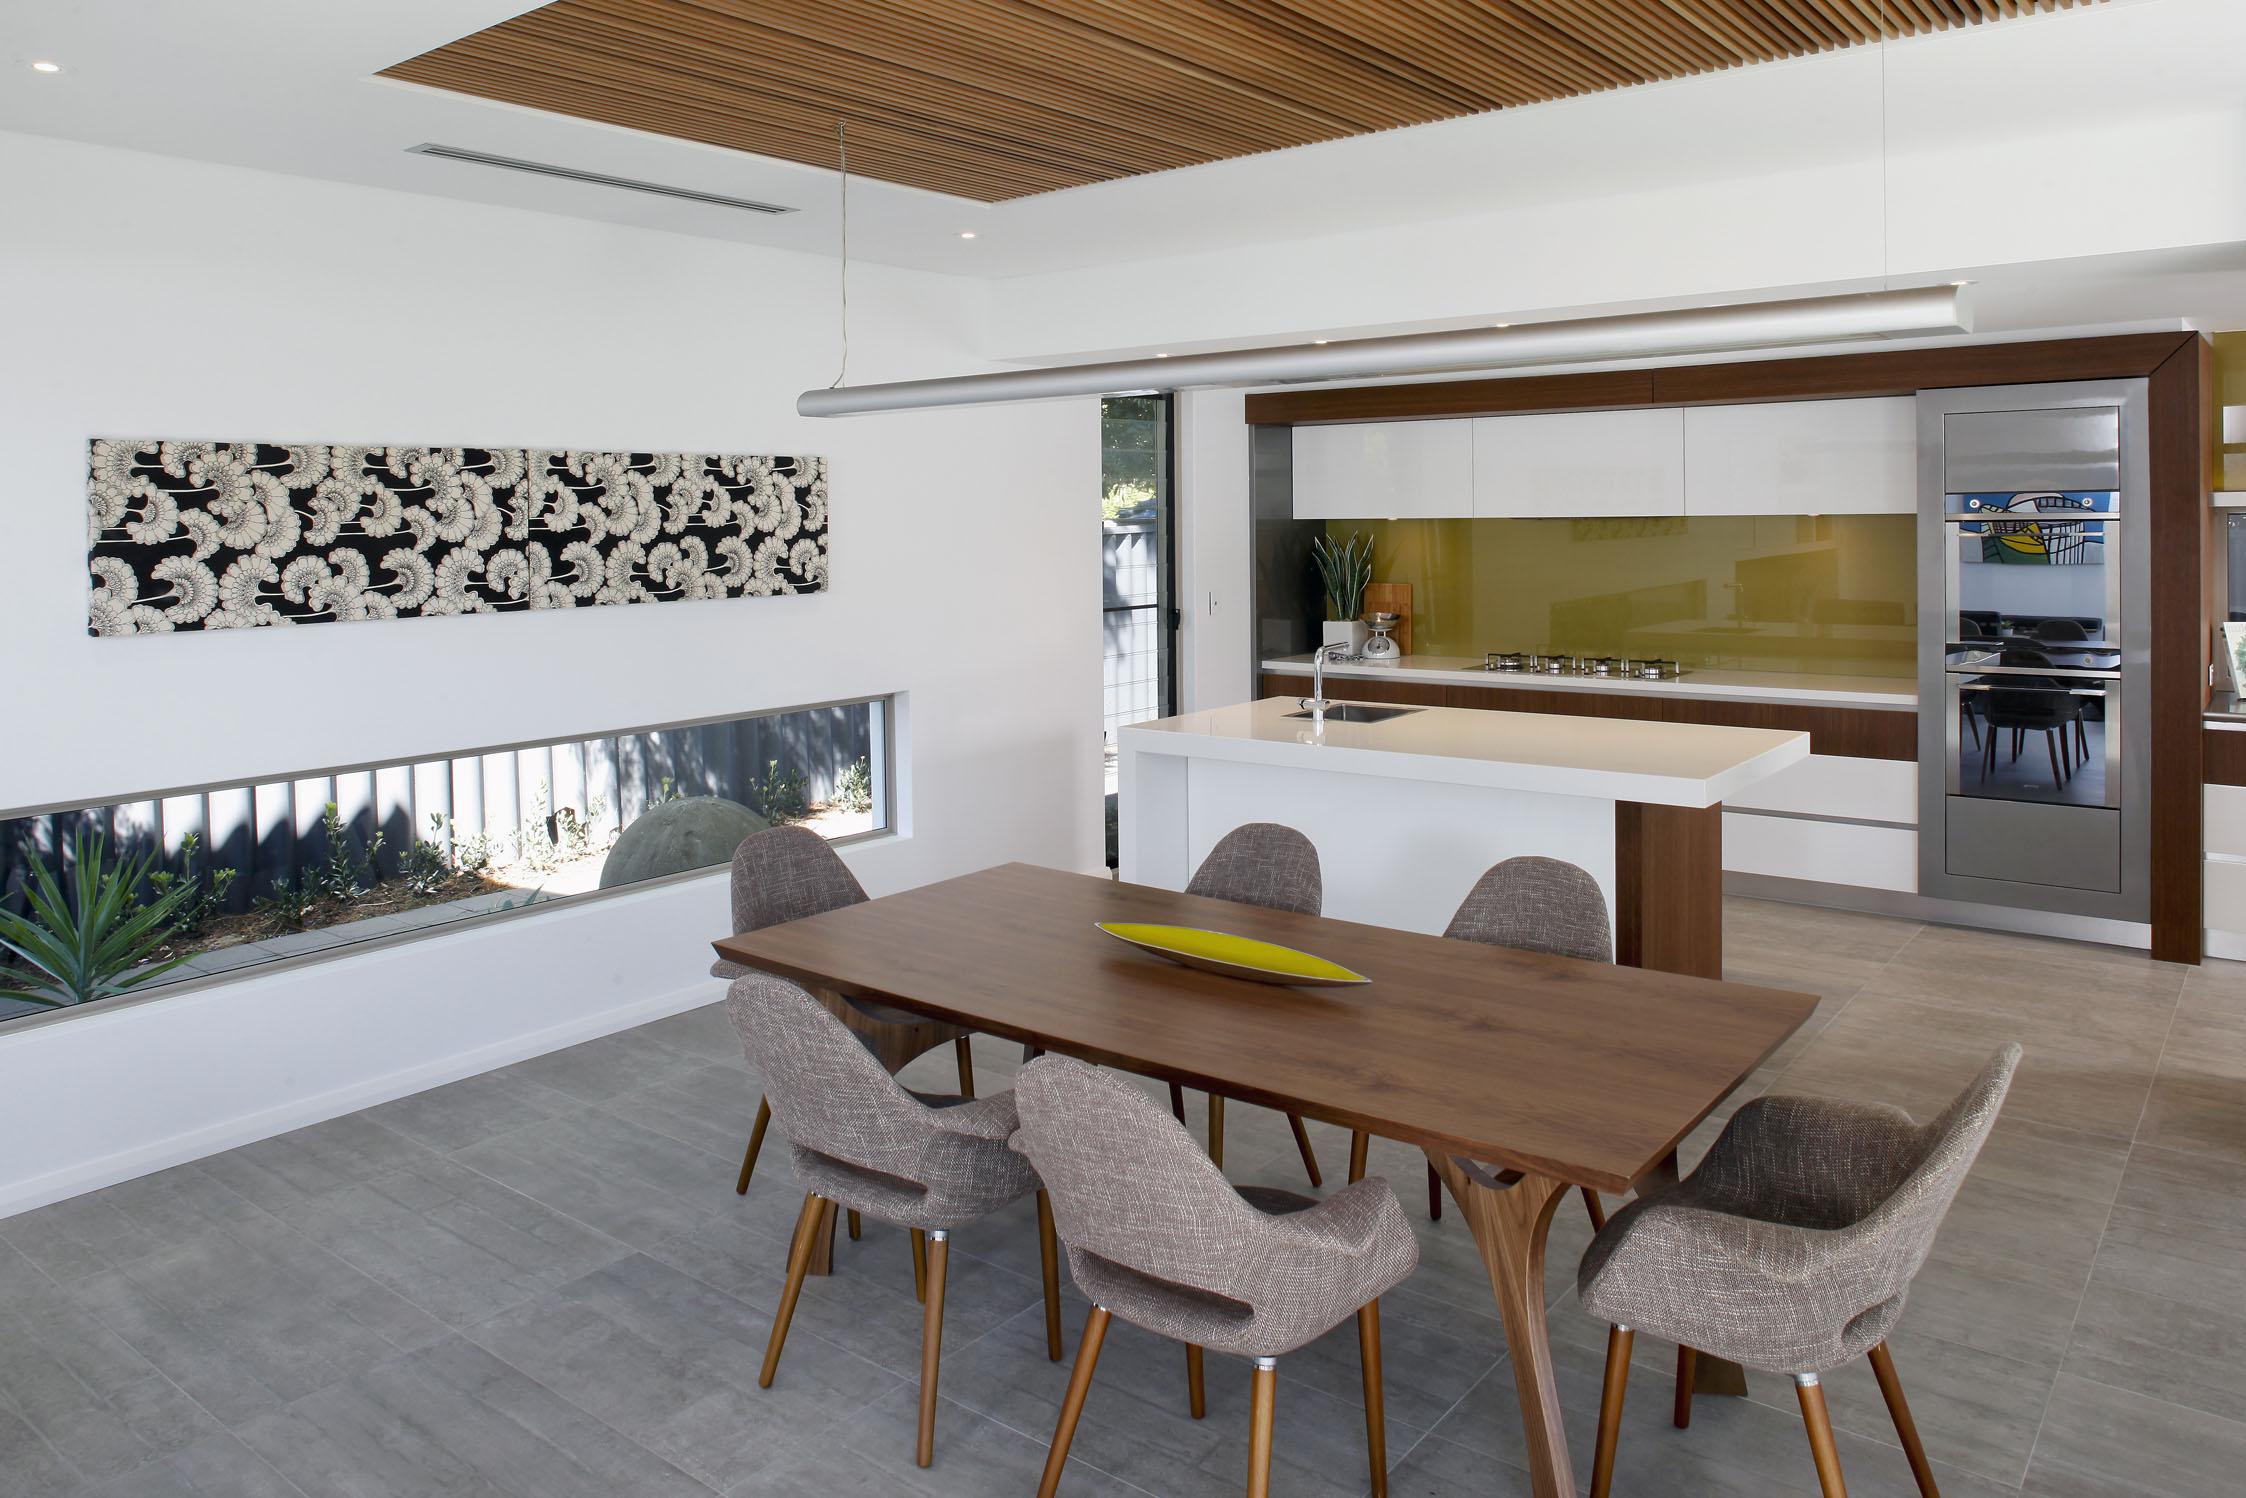 2014 hia australian kitchen bathroom awards. Black Bedroom Furniture Sets. Home Design Ideas